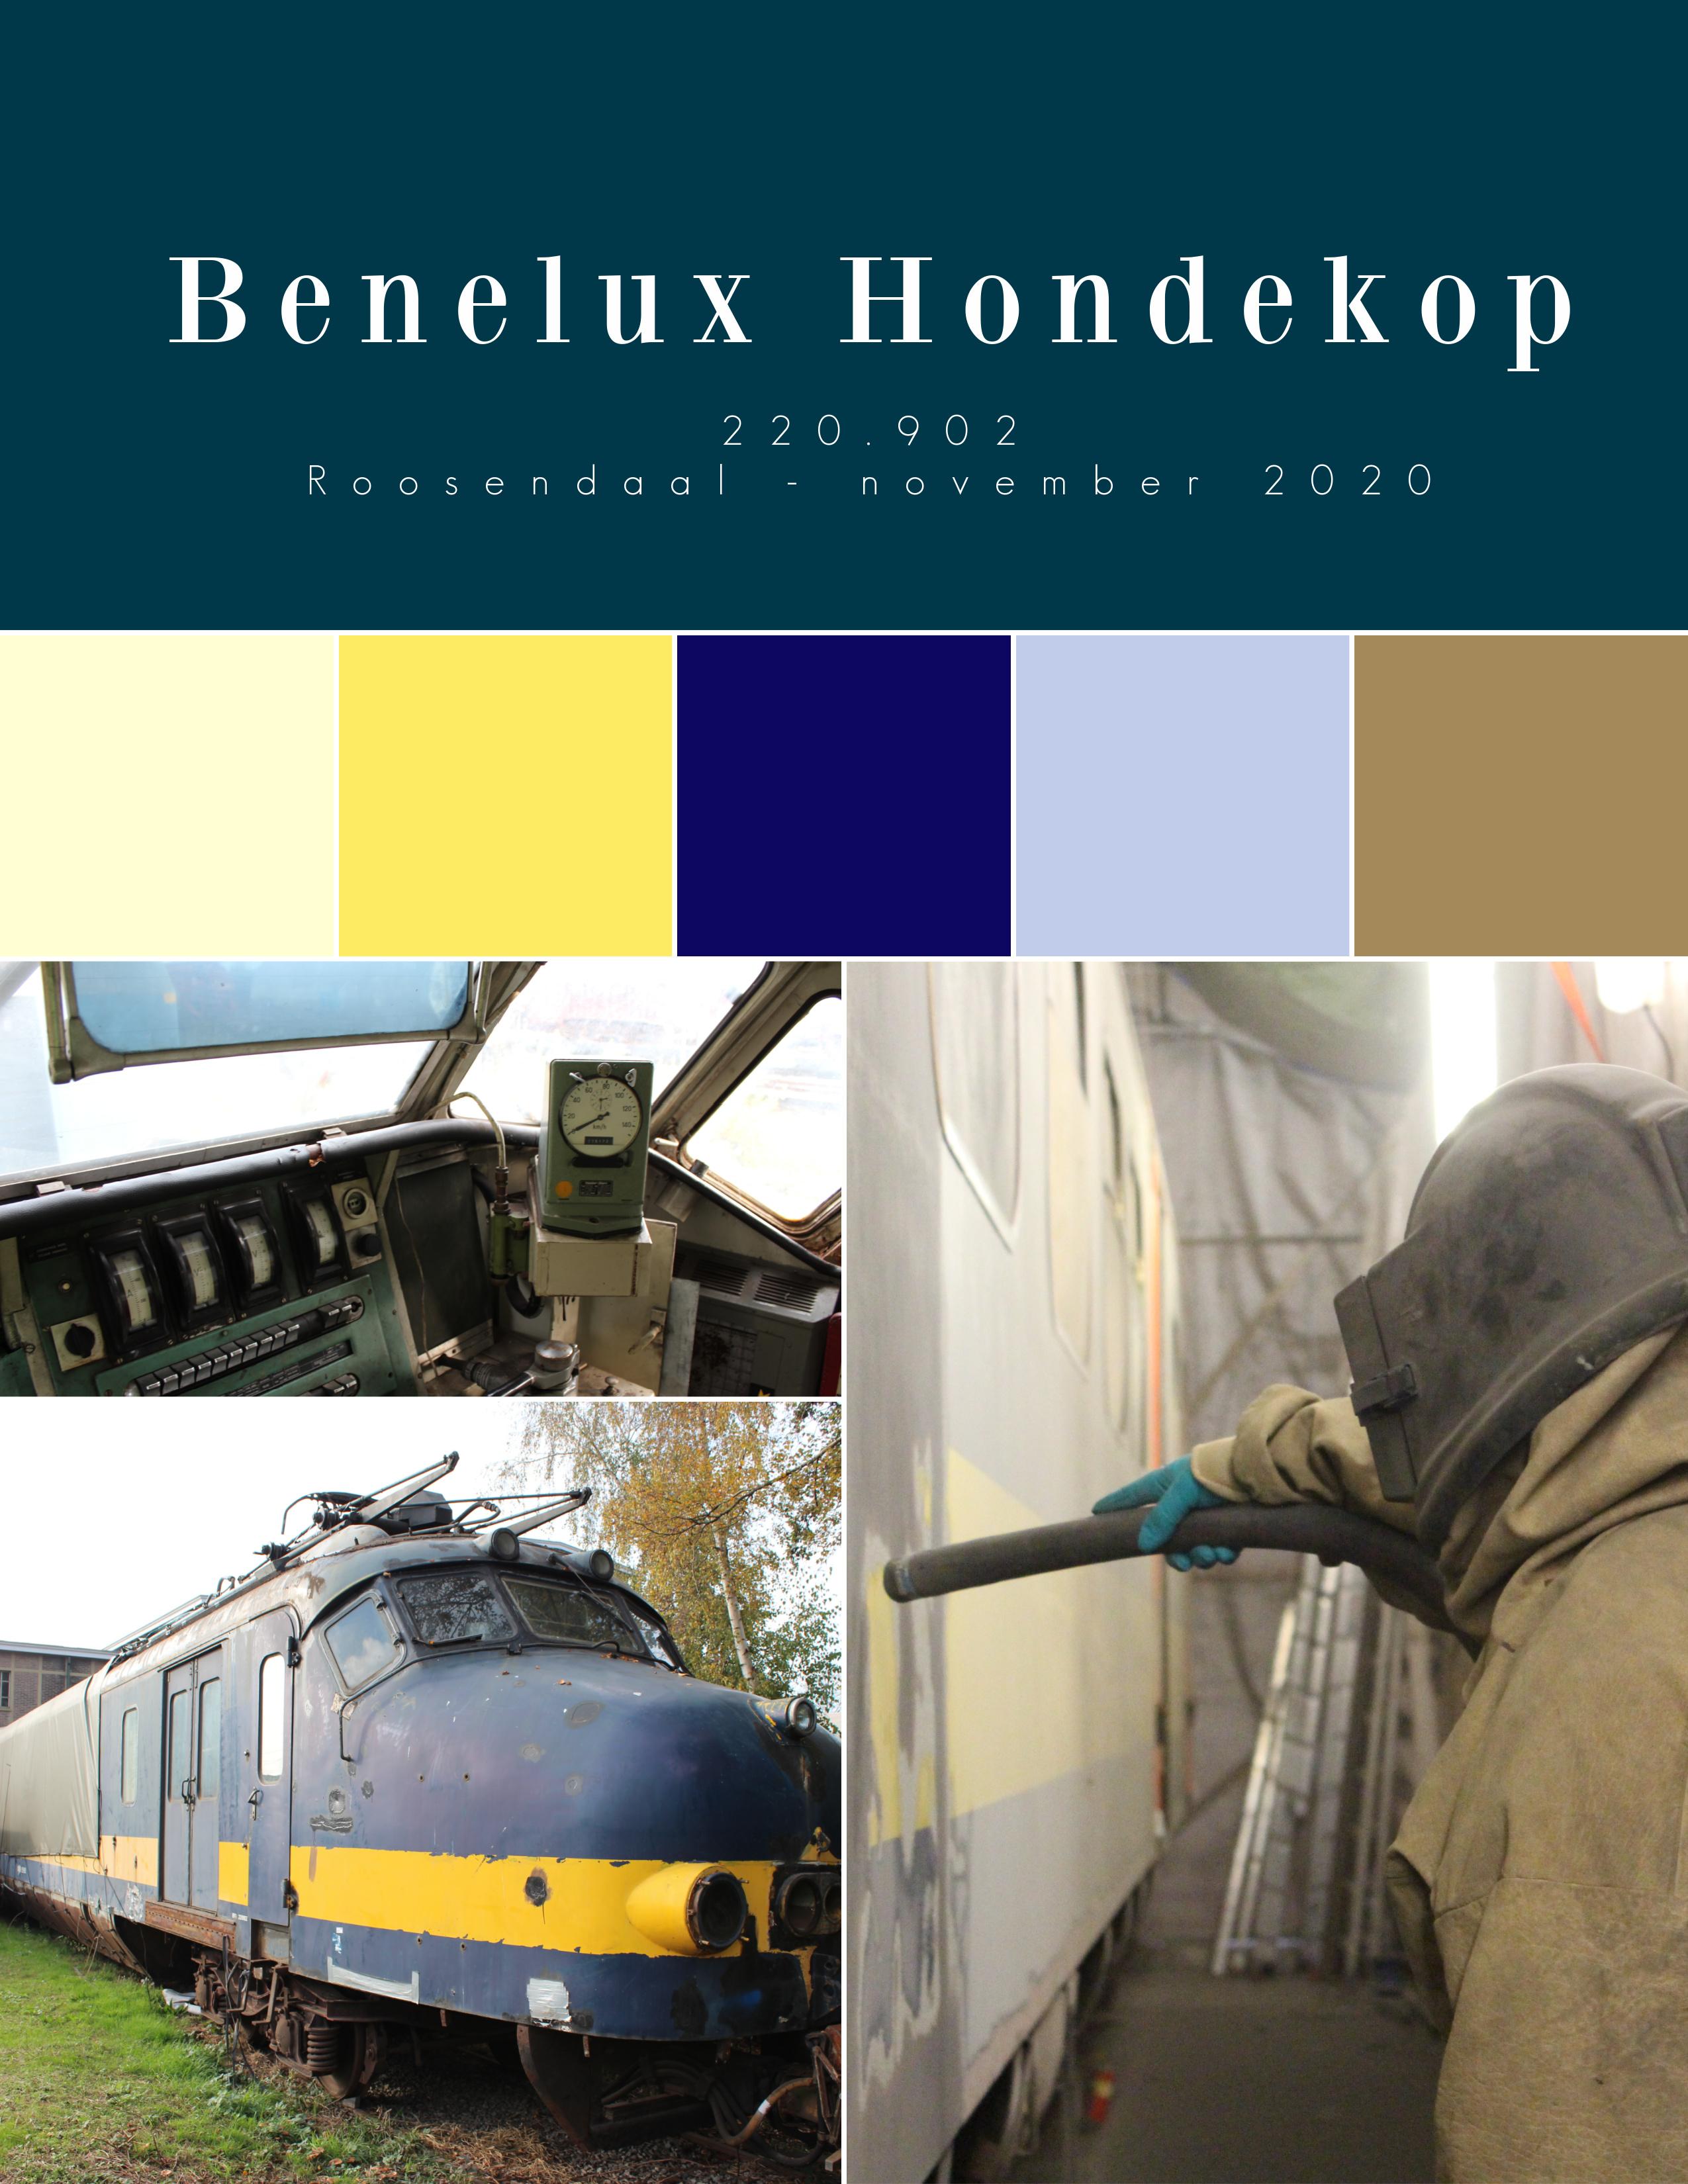 PR fotoserie Benelux Hondekop 220.902 11-2020 Roosendaal